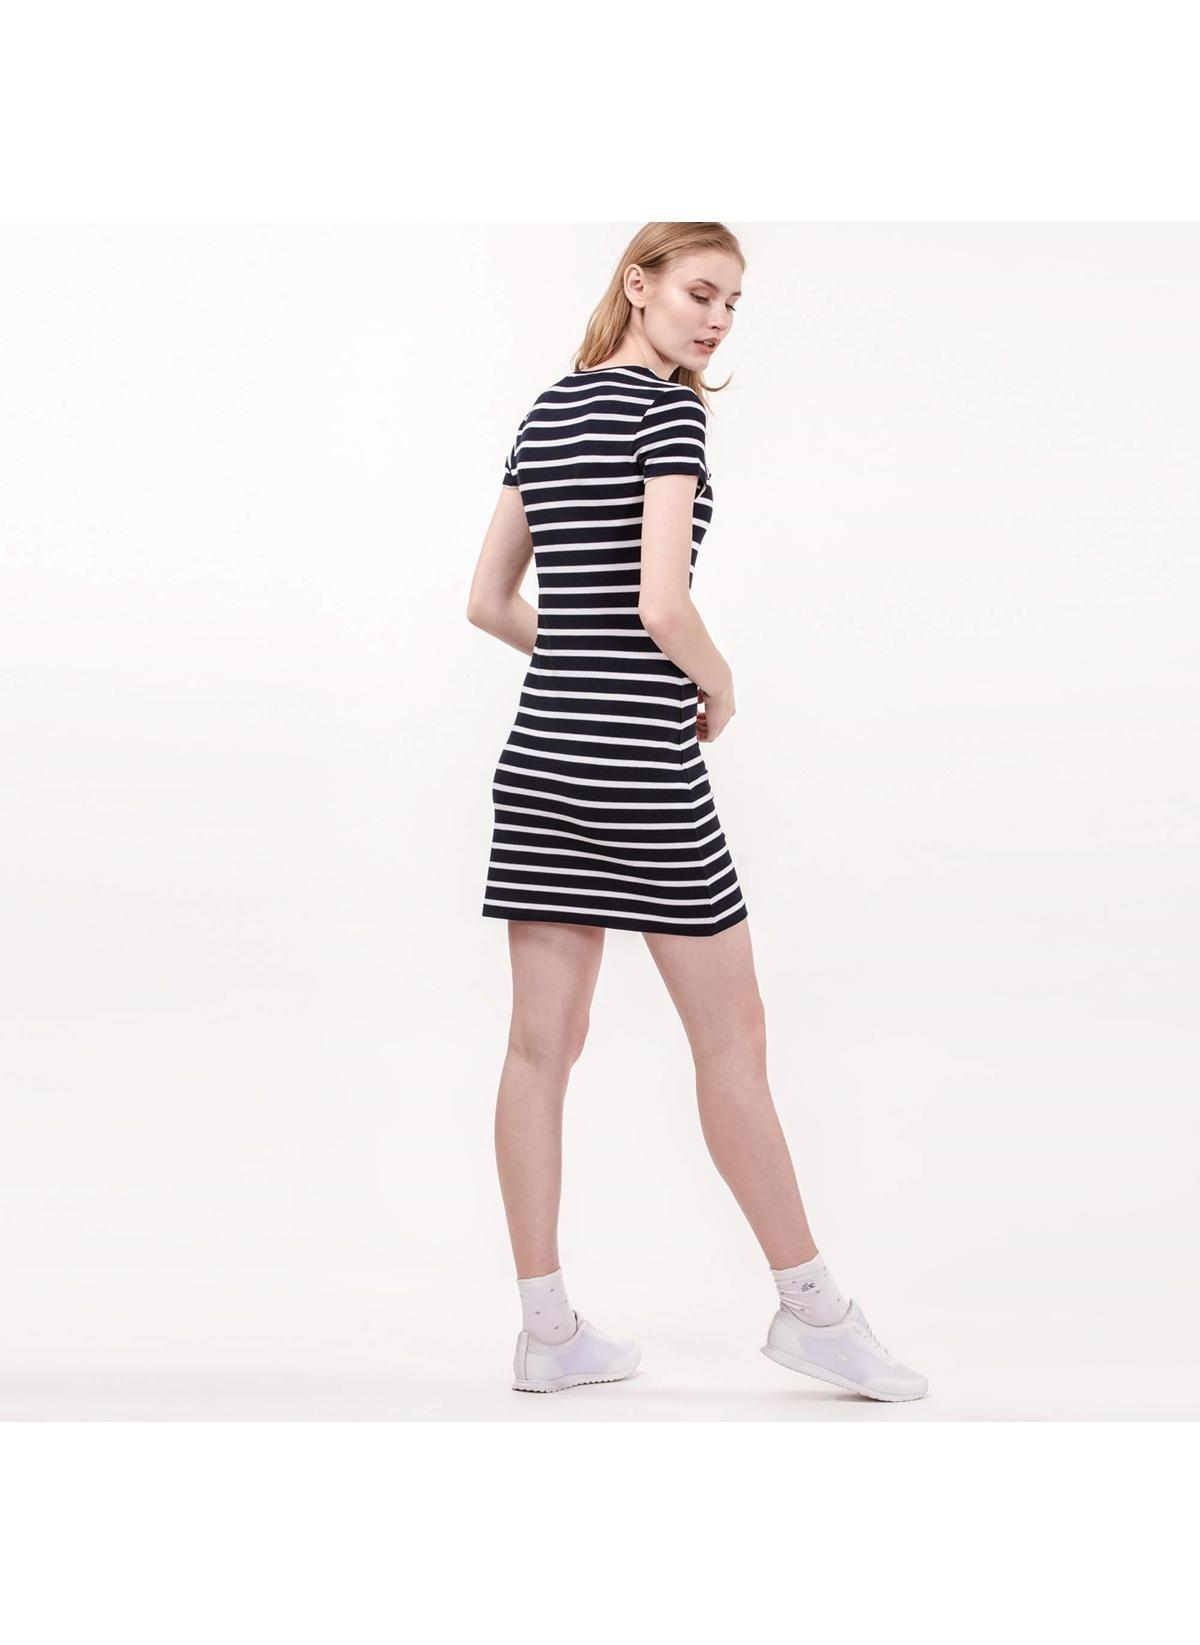 4595eb970509b Lacoste Kadın Kısa Kollu Çizgili Mini Elbise Renkli | Morhipo | 21006055